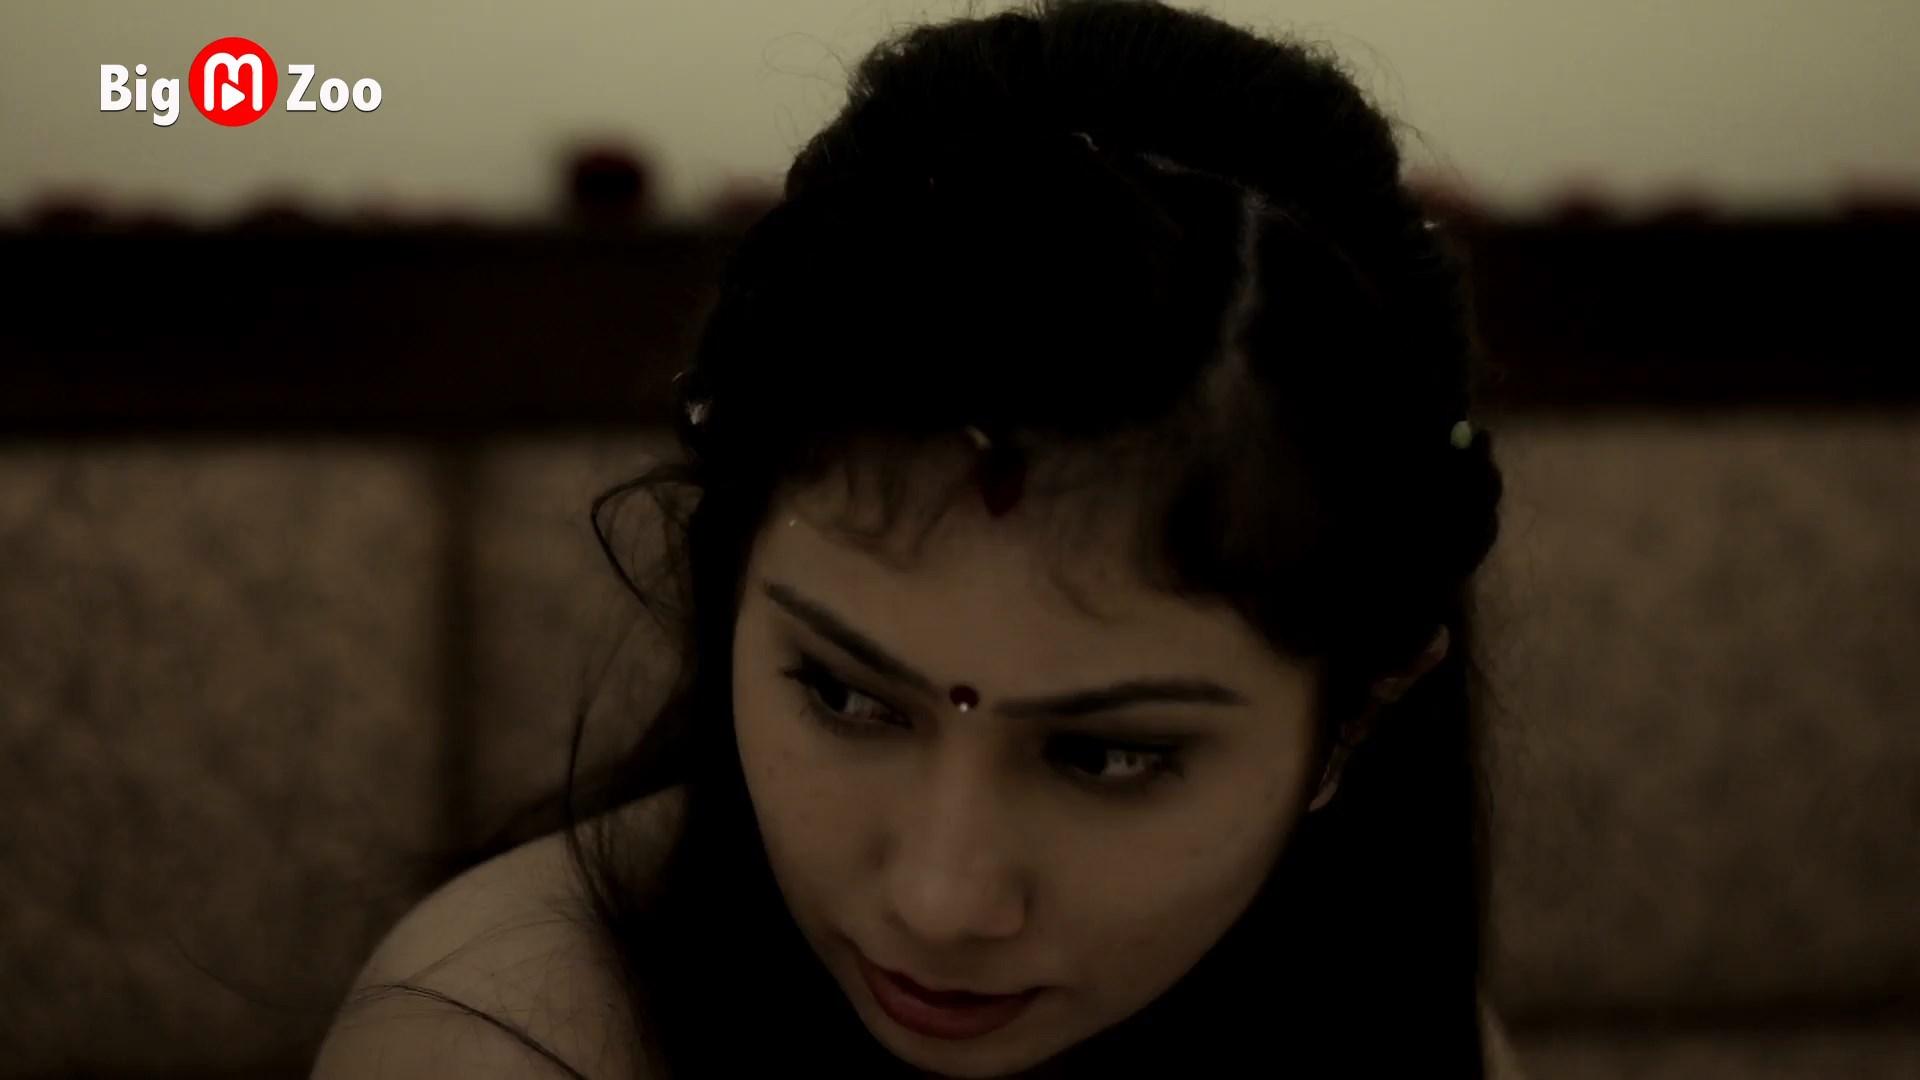 rh 9 - 18+ Rooh 2020 Big Movie Zoo App Originals Hindi Short Film 720p HDRip 70MB x264 AAC